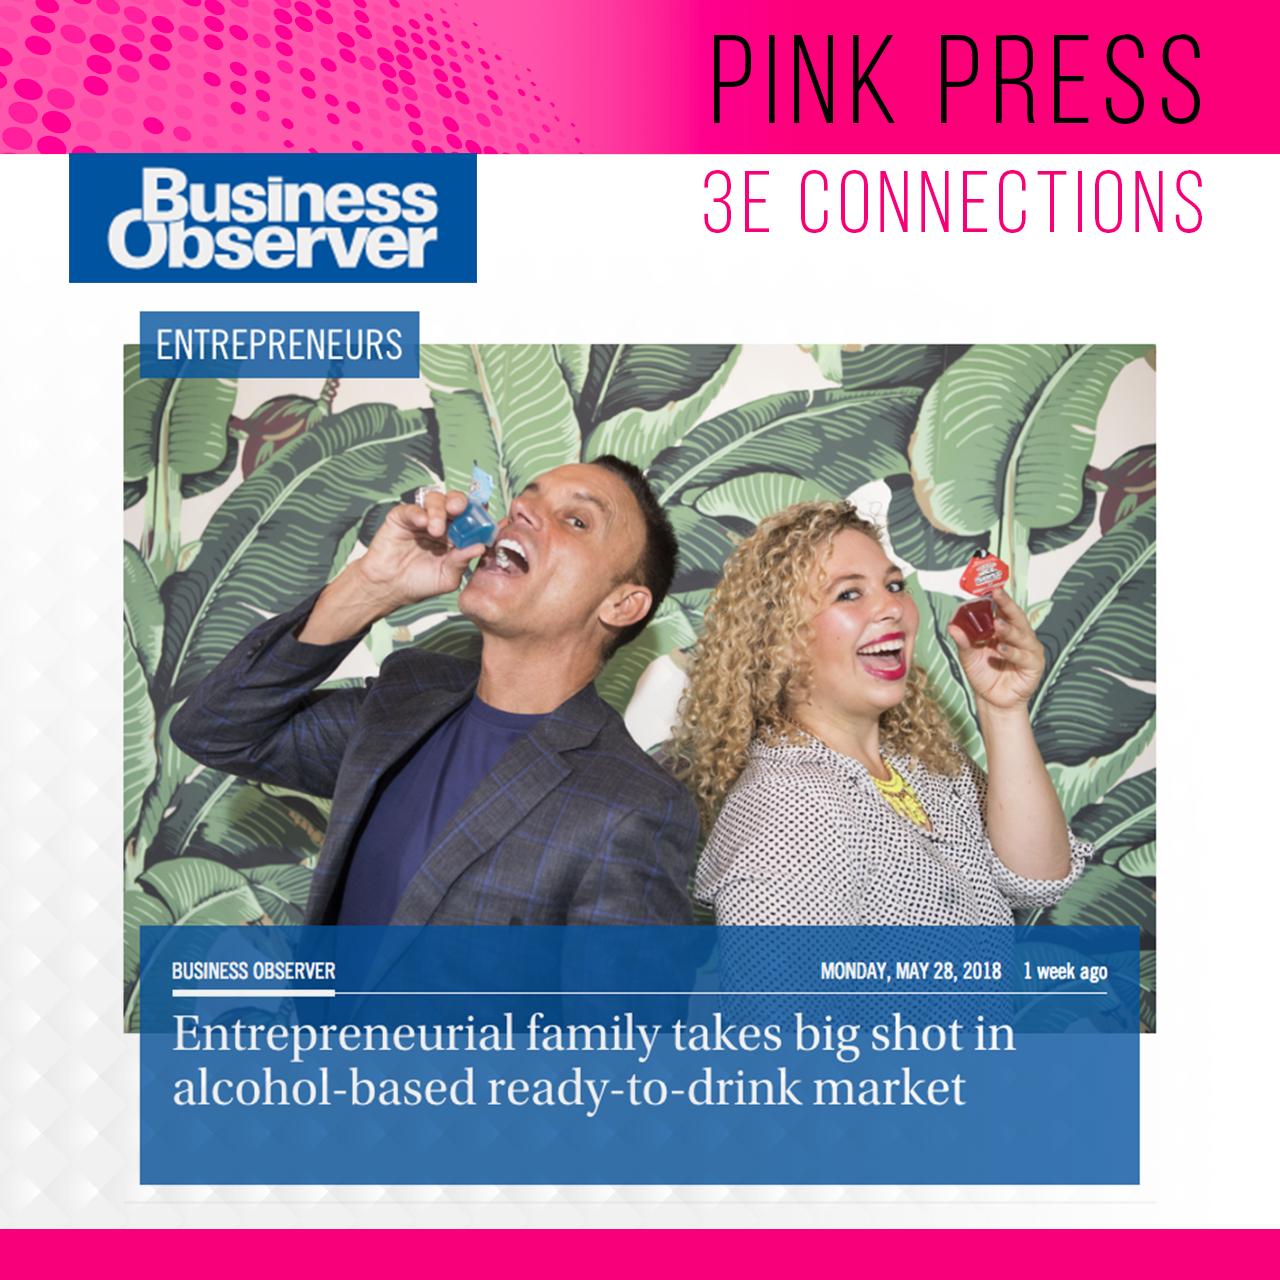 PinkPress_BusinessObserver.png